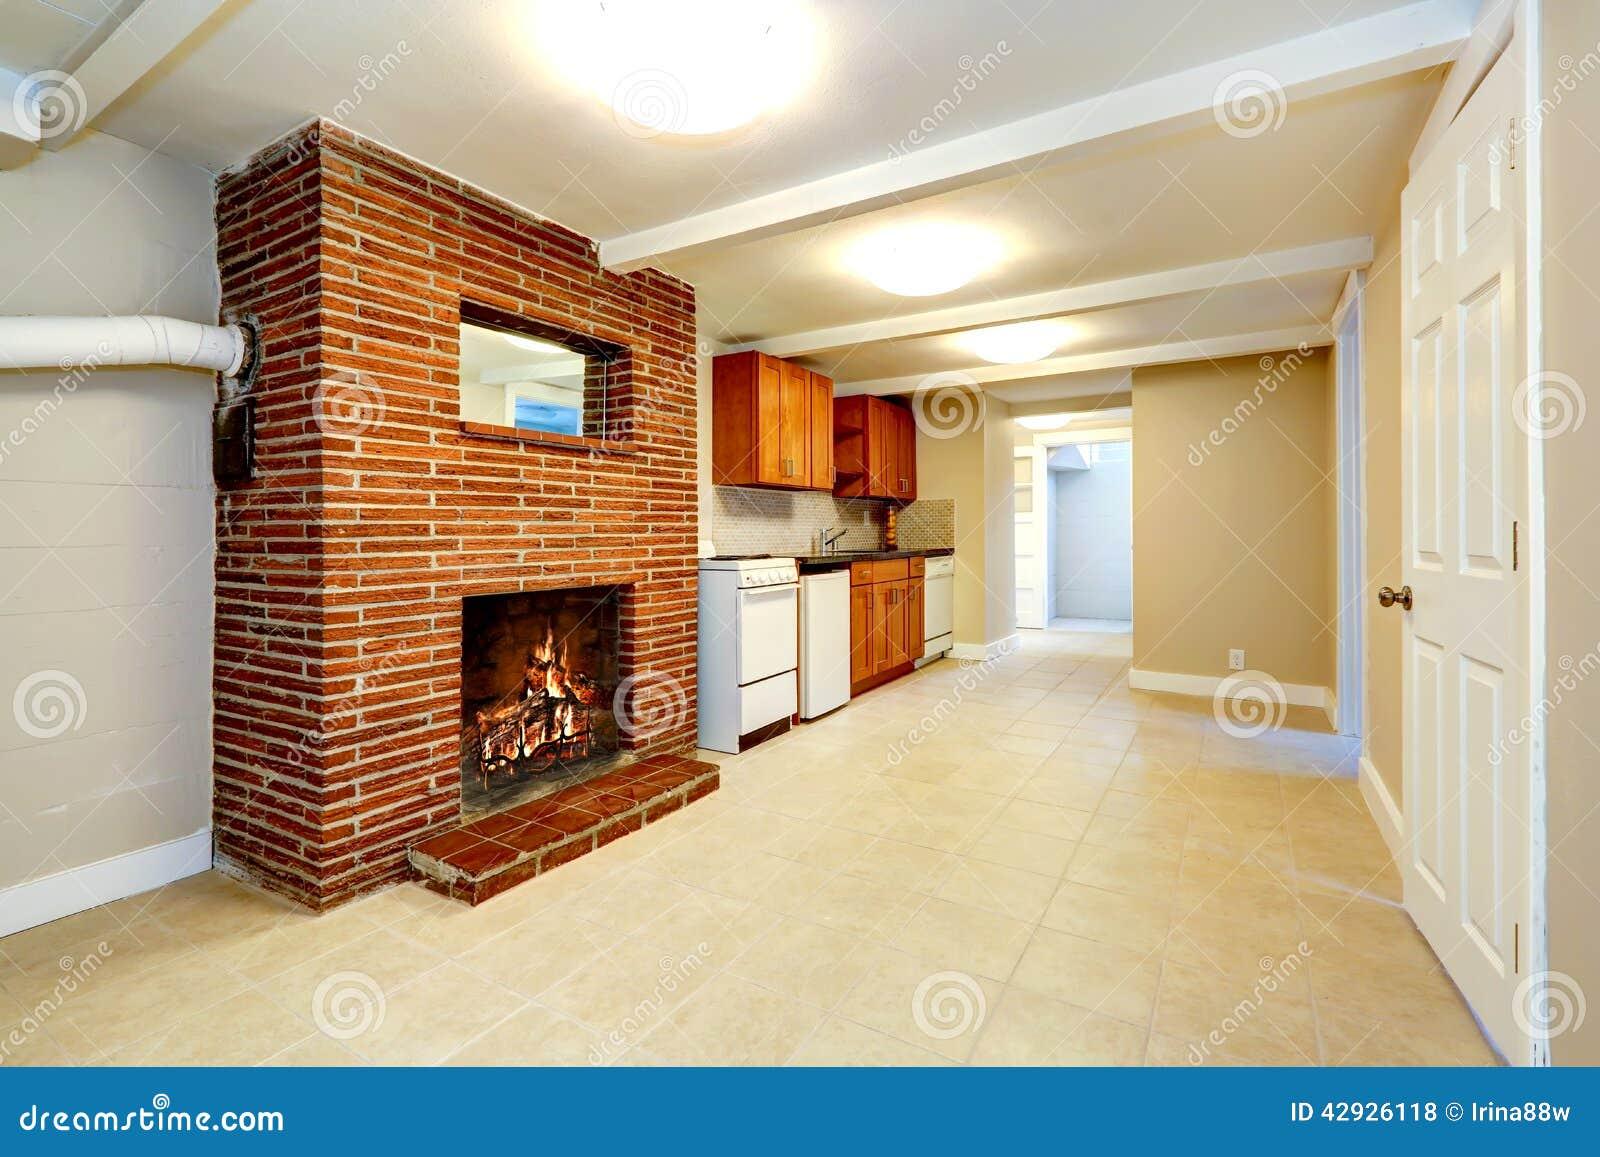 empty basement room with brick fireplace stock photo image 42926118